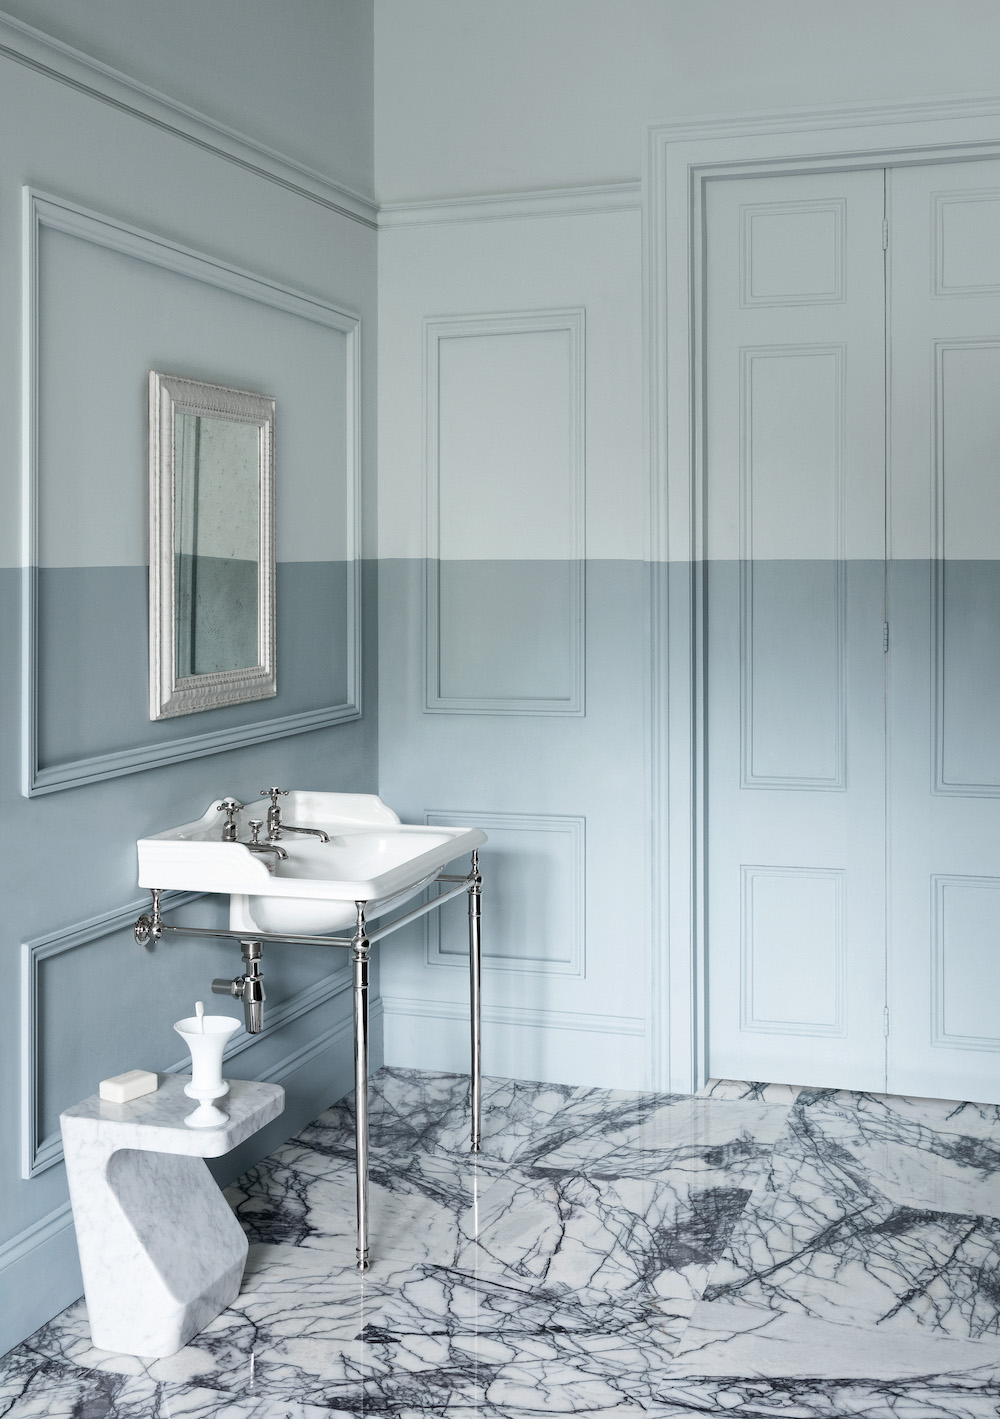 Badkamer kleur. Pasteltinten Paint & Paper library #badkamer #kleur #muurverf #pastel #inspiratie